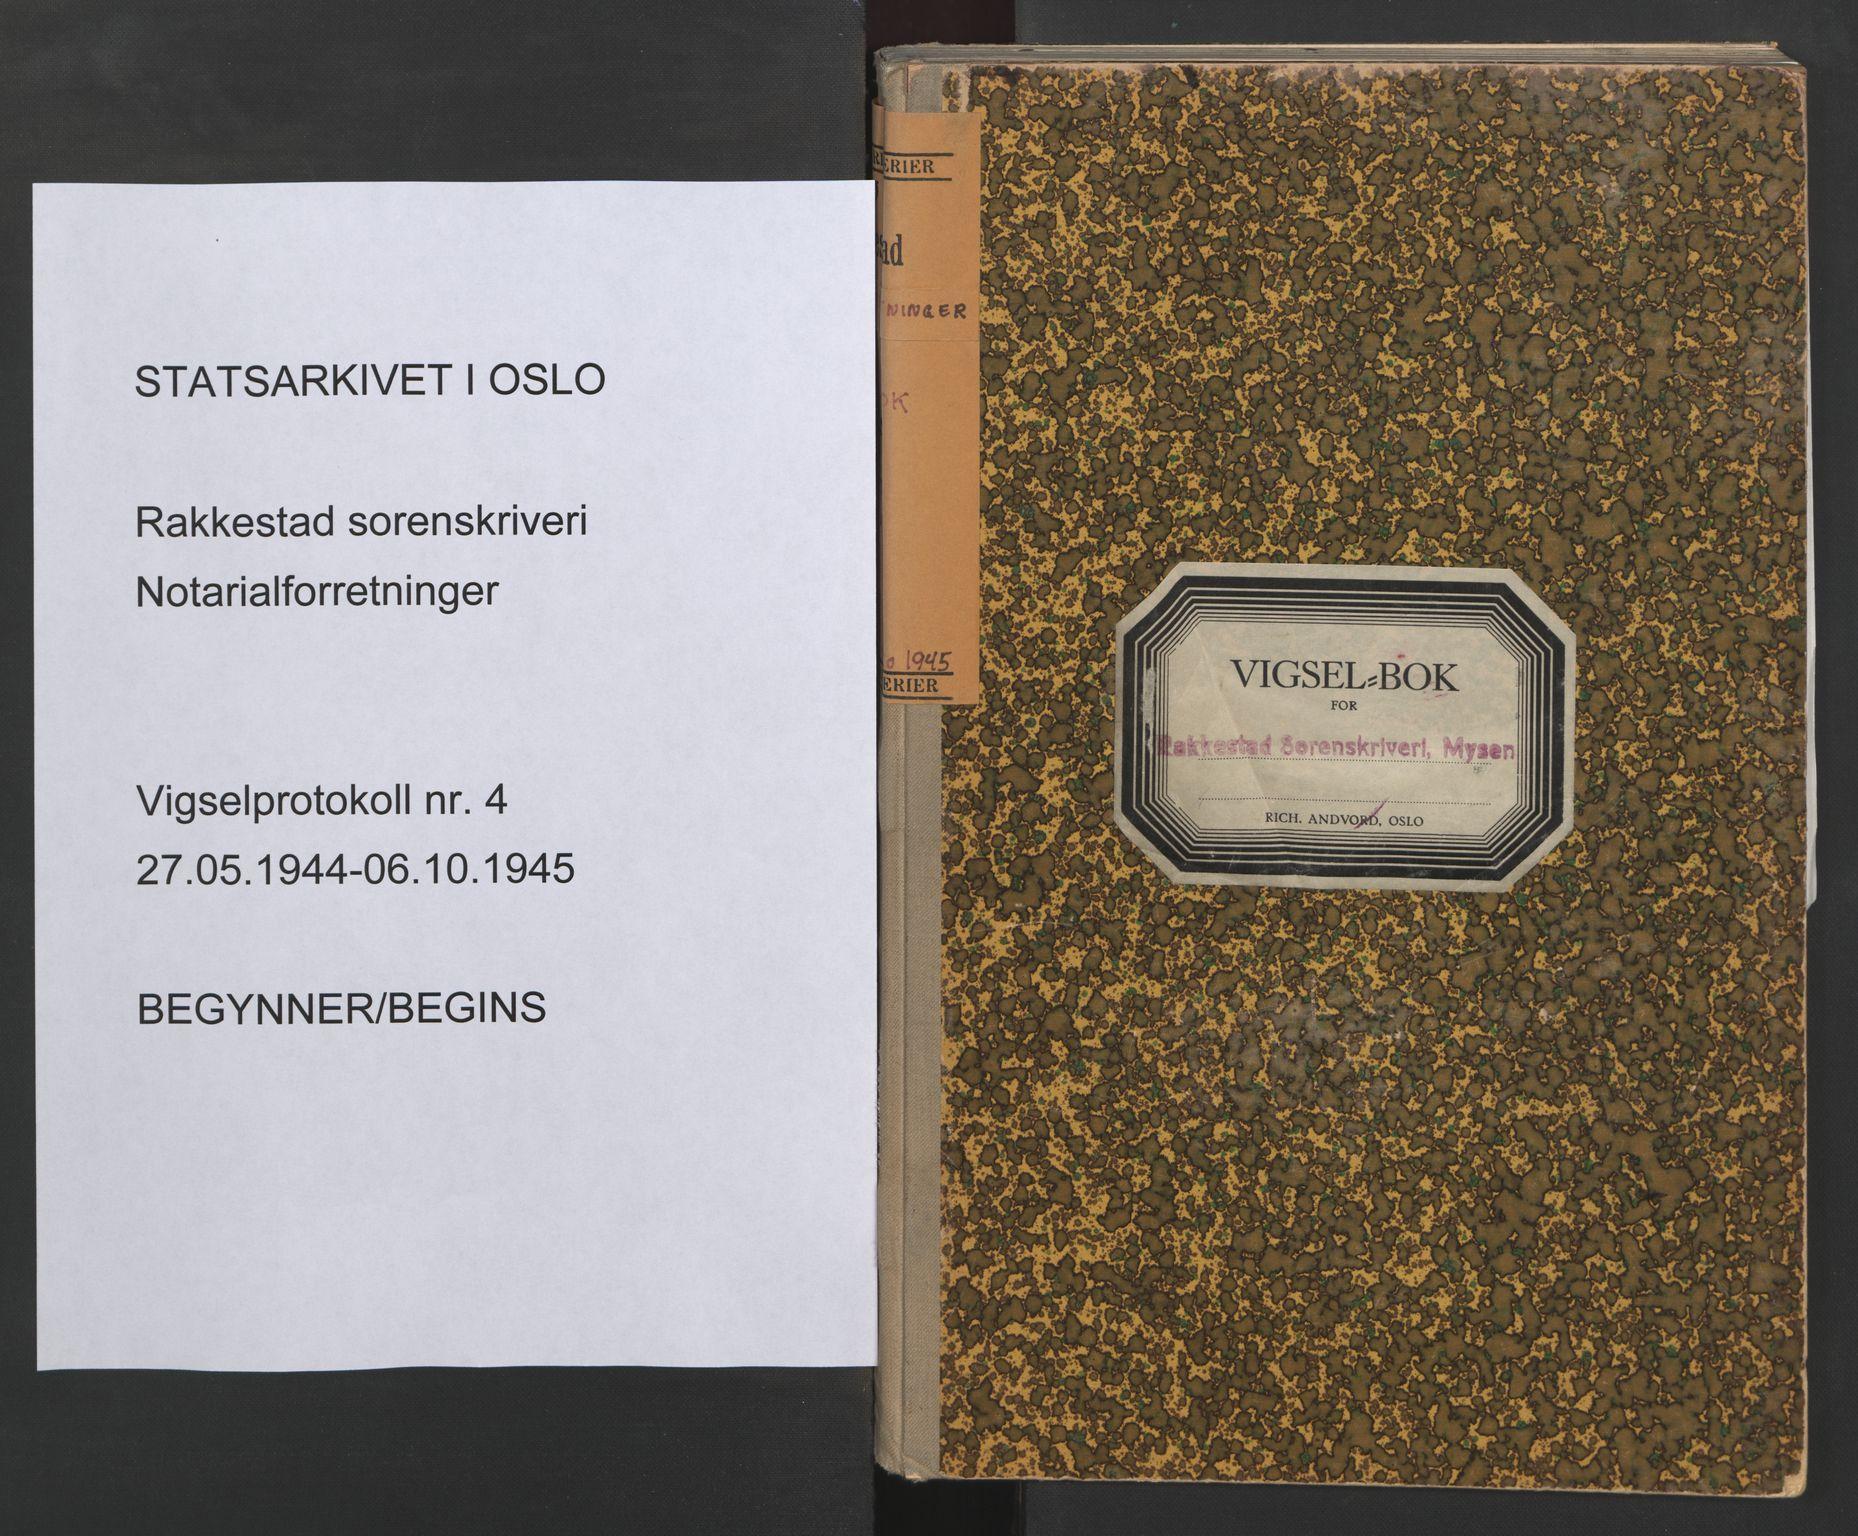 SAO, Rakkestad sorenskriveri, L/Lc/Lca/L0004: Vigselbøker, 1944-1945, s. upaginert